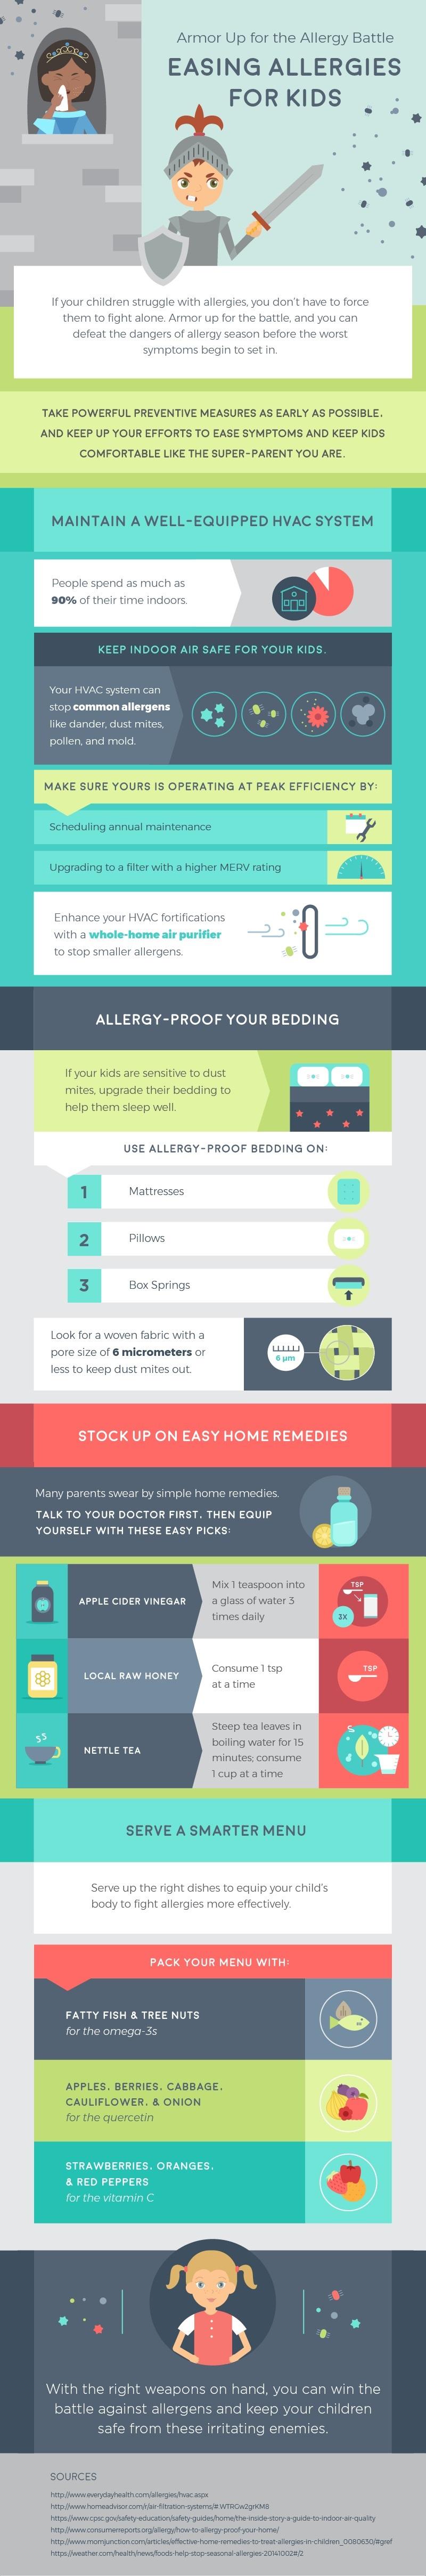 against allergens